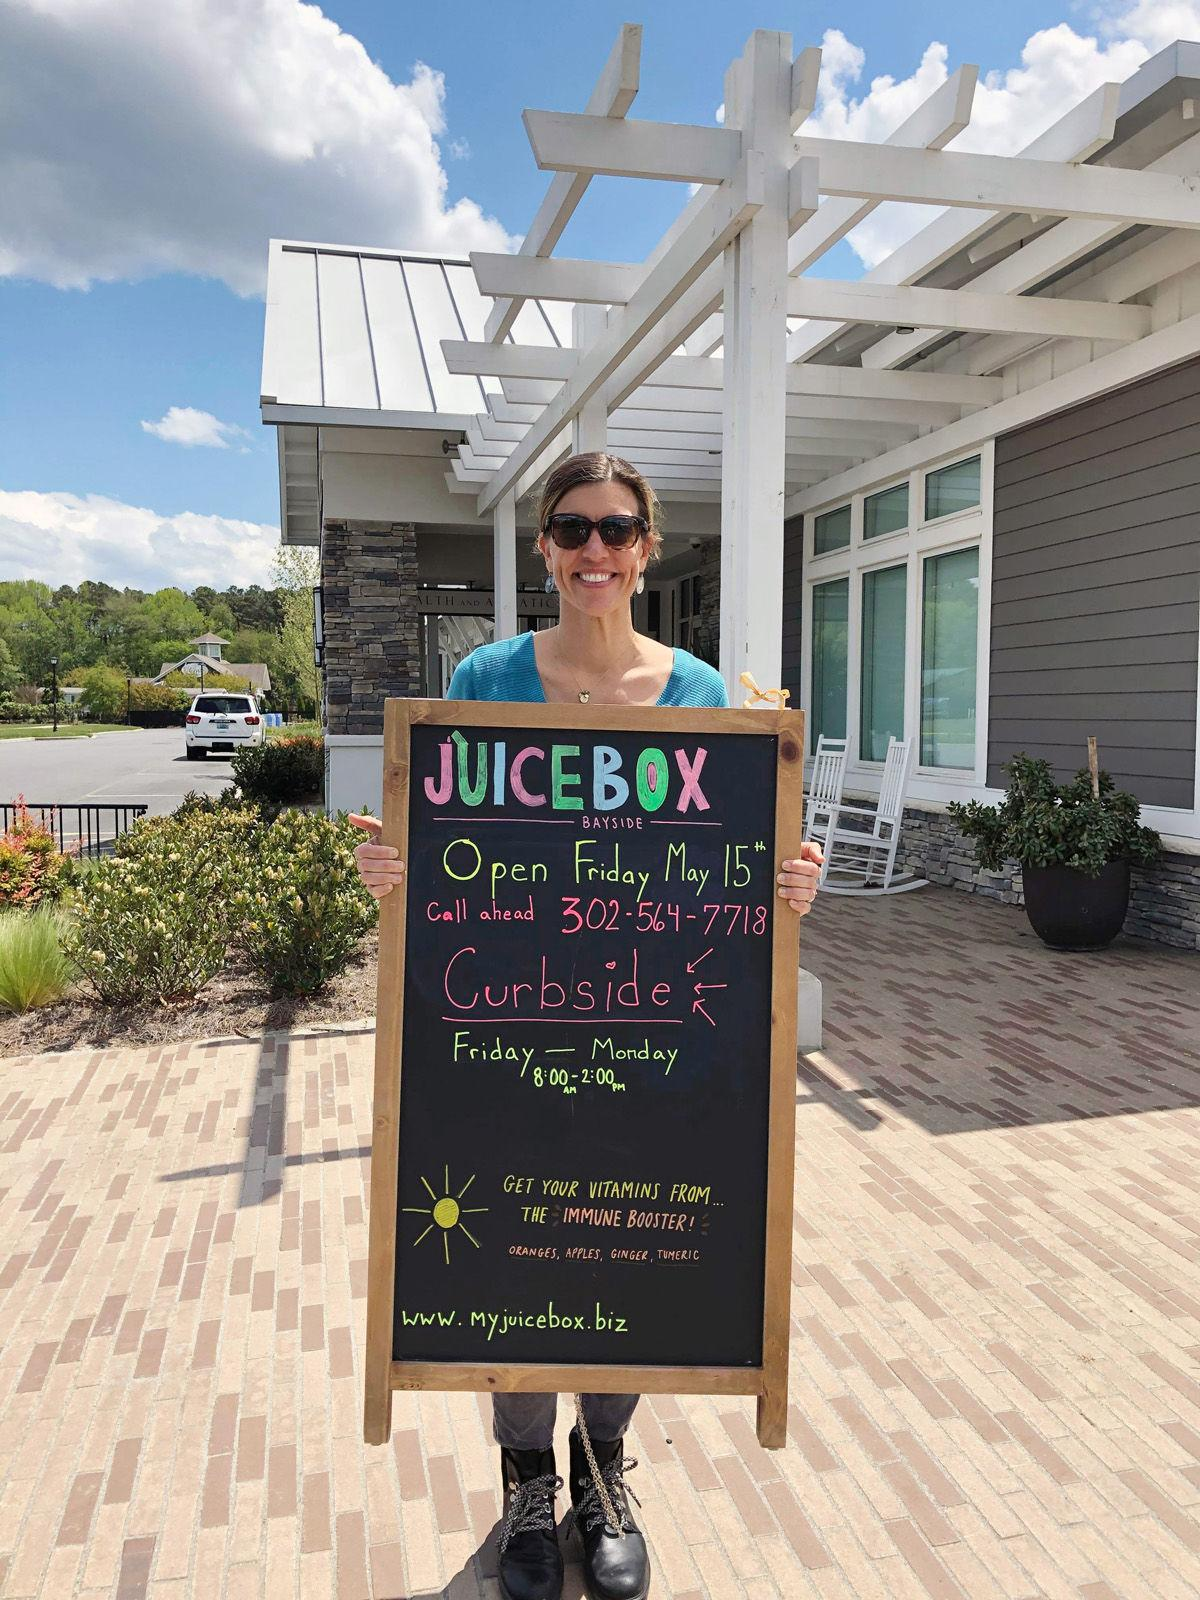 Juicebox opening May 15